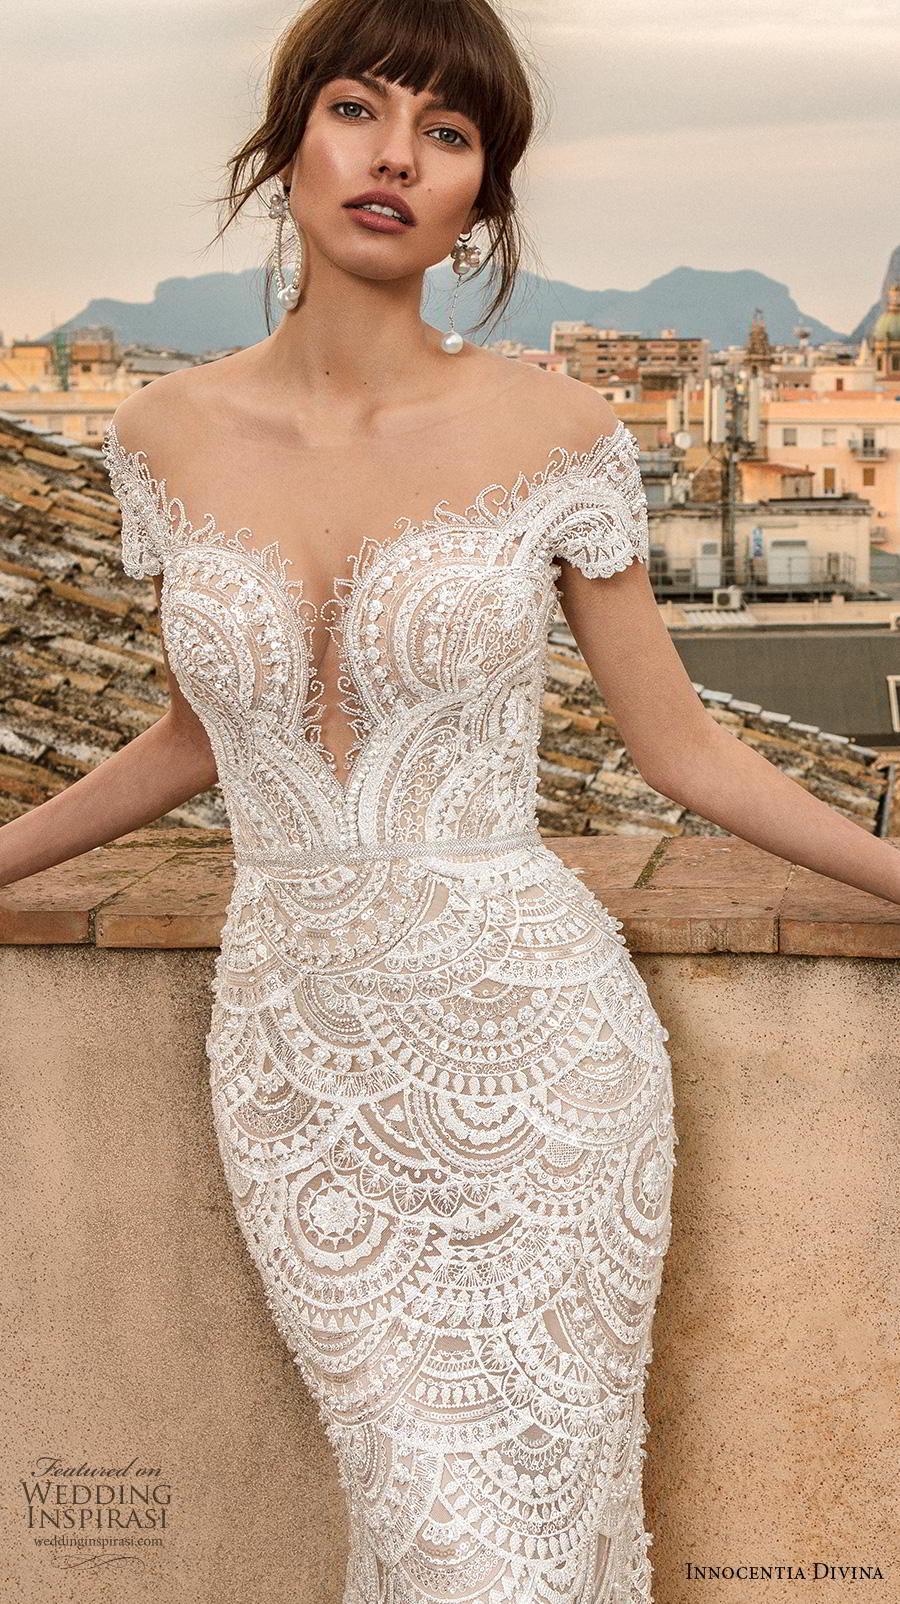 innocentia divina 2020 bridal short sleeves illusion bateau v neck full embellishment elegant fit and flare sheath wedding dress mid back medium train (9) zv